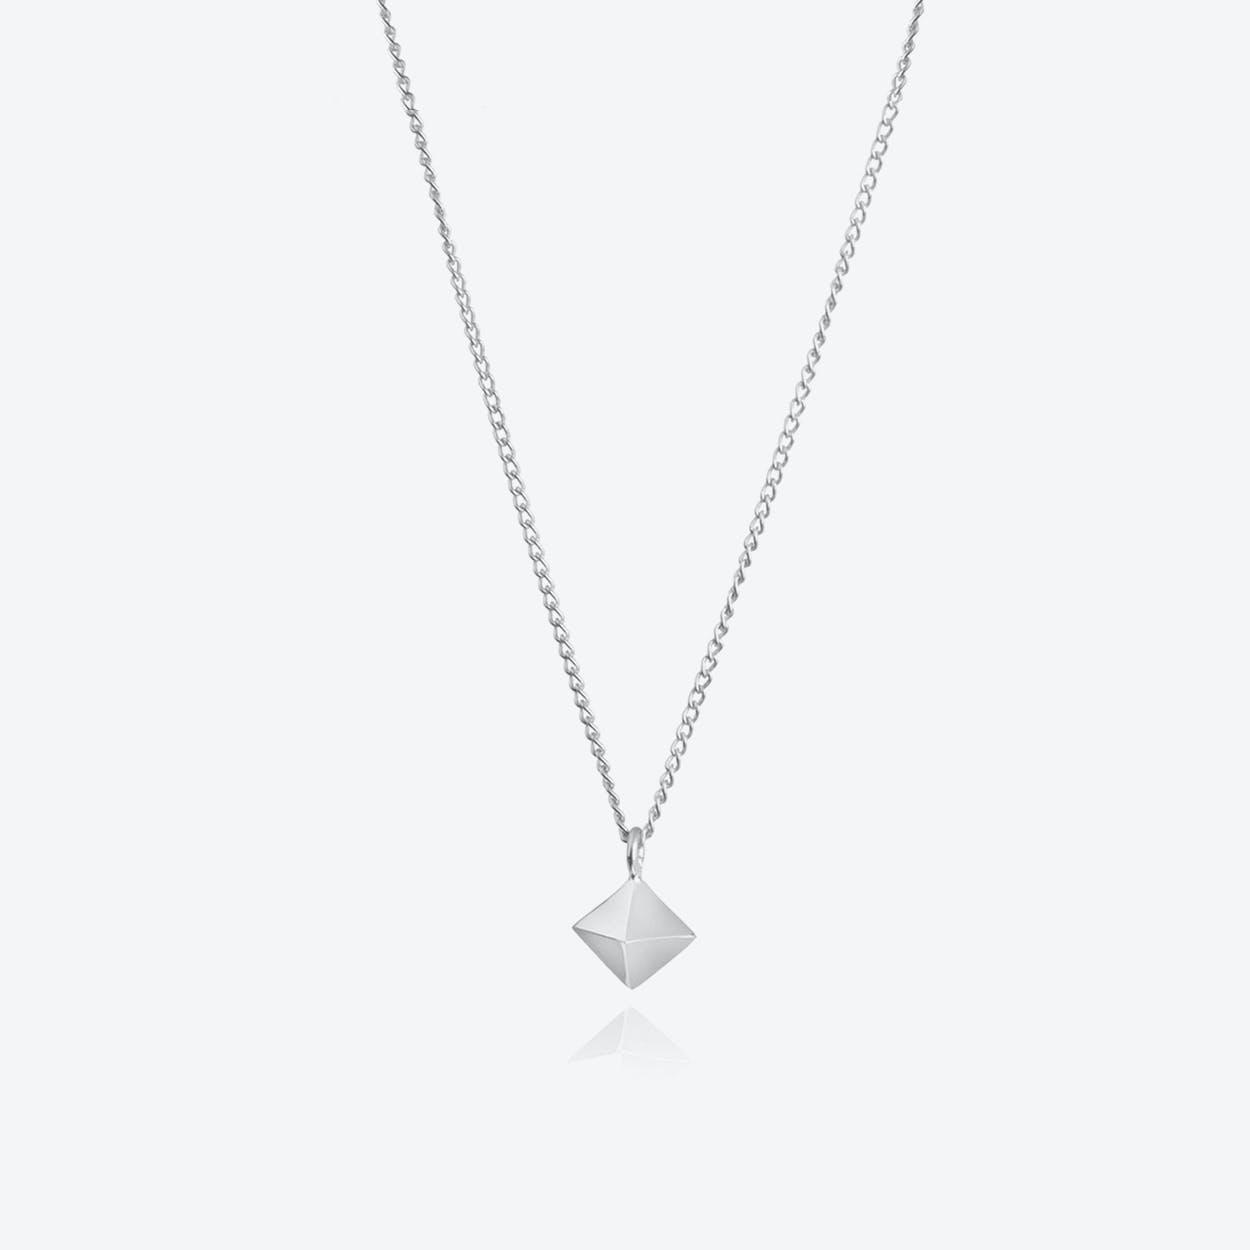 Mini Octahedron Pendant in Silver